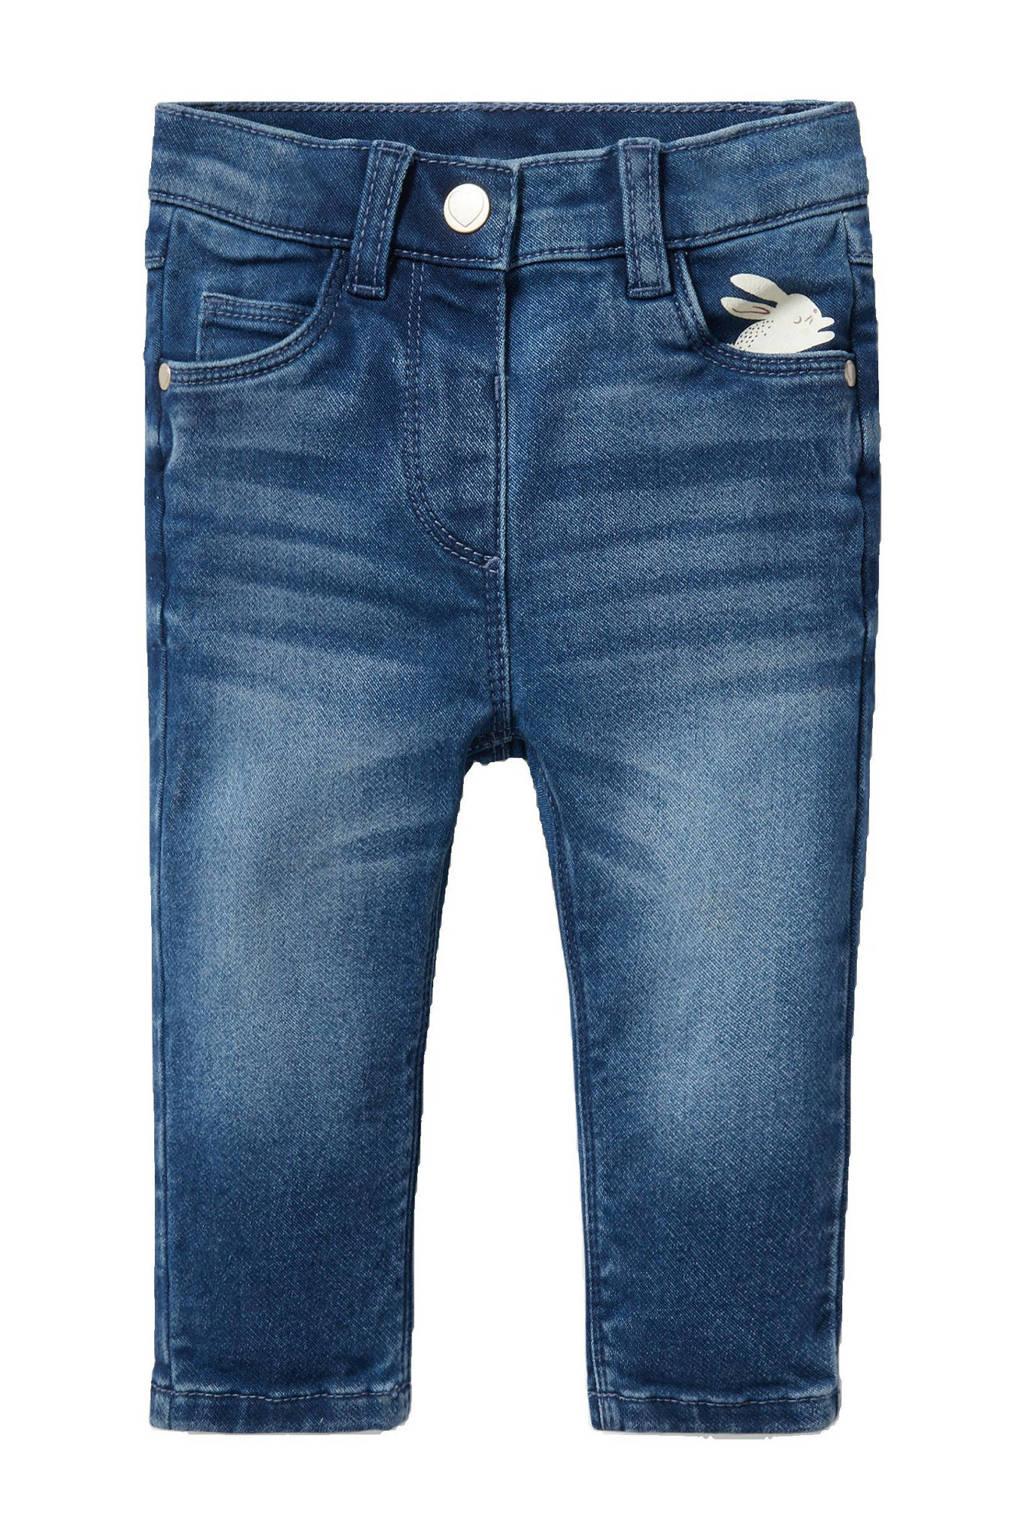 C&A Baby Club slim fit jeans blauw, Blauw